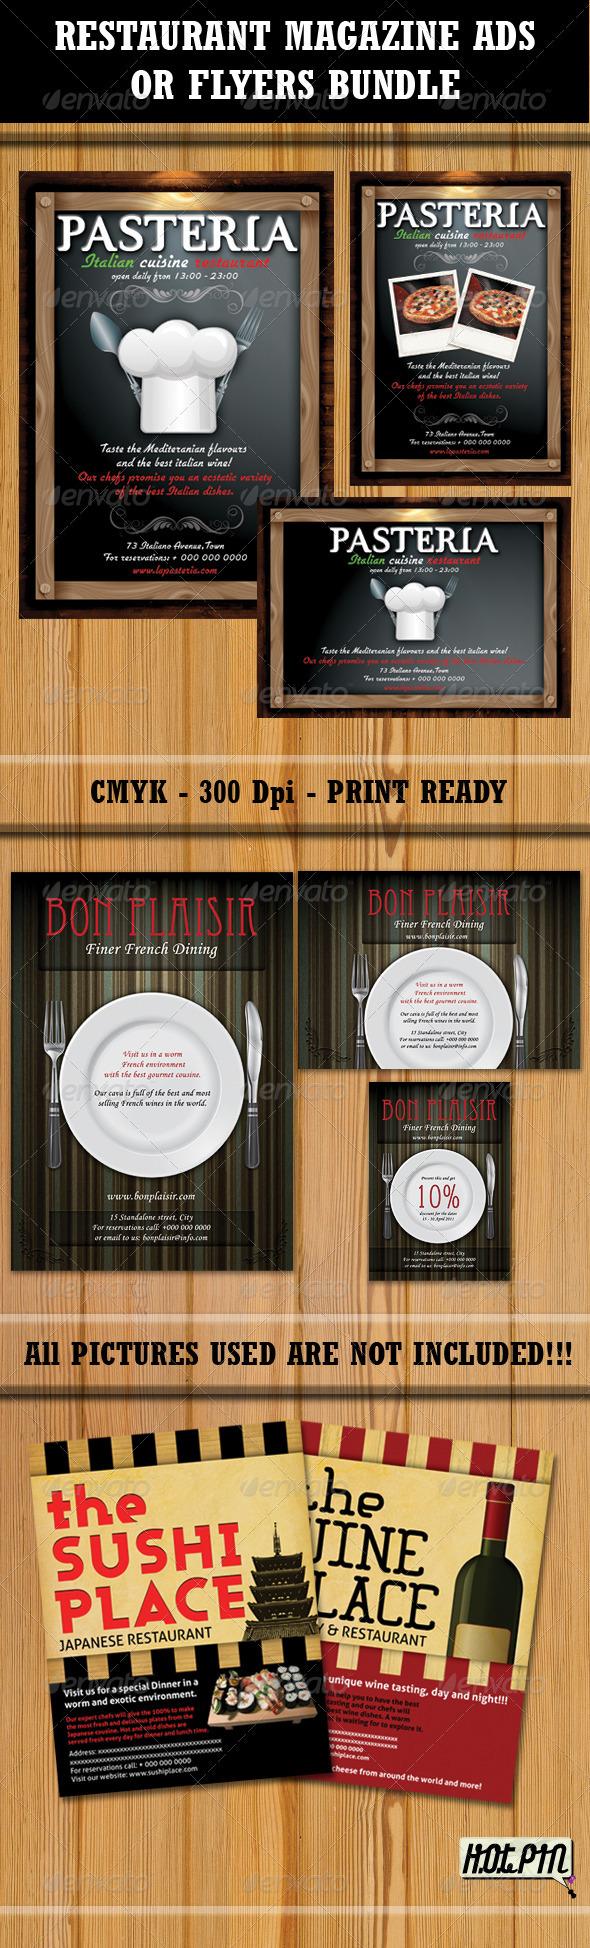 GraphicRiver Restaurant Magazine Ads-Flyers Bundle 335953